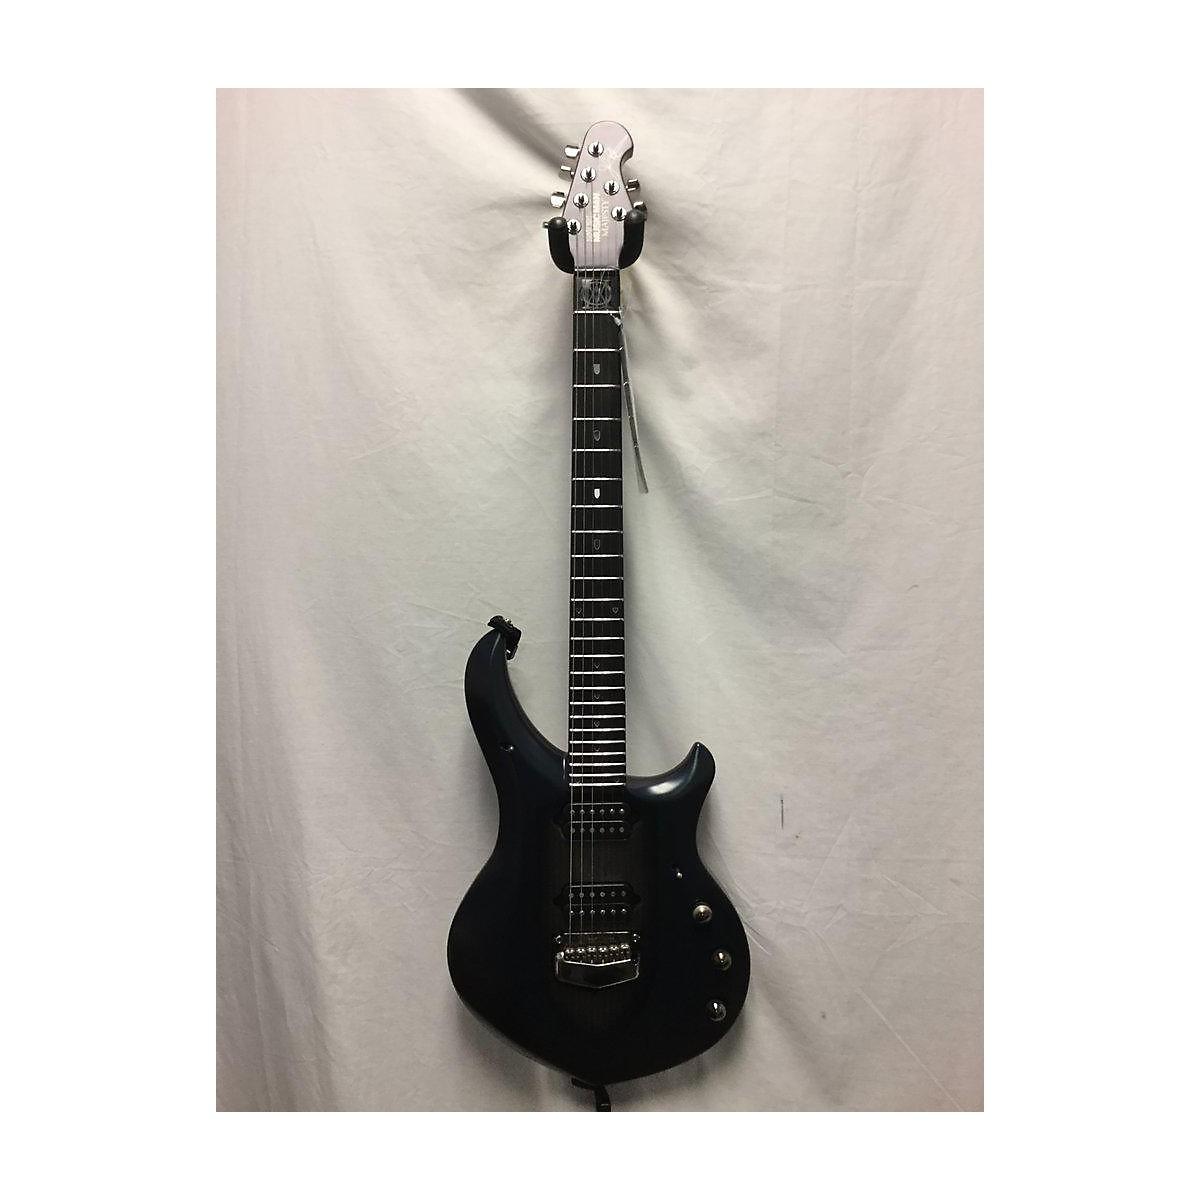 Ernie Ball Music Man Majesty Solid Body Electric Guitar